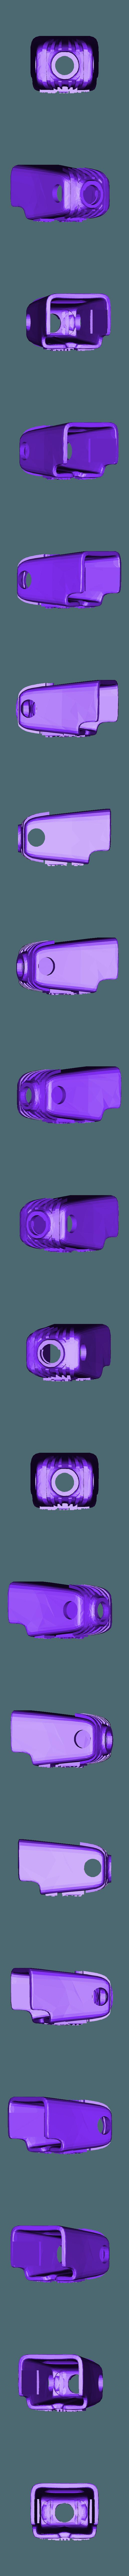 Body_Darth_Vader.stl Download free STL file Darth Vader Playmobil • 3D printable object, madsoul666